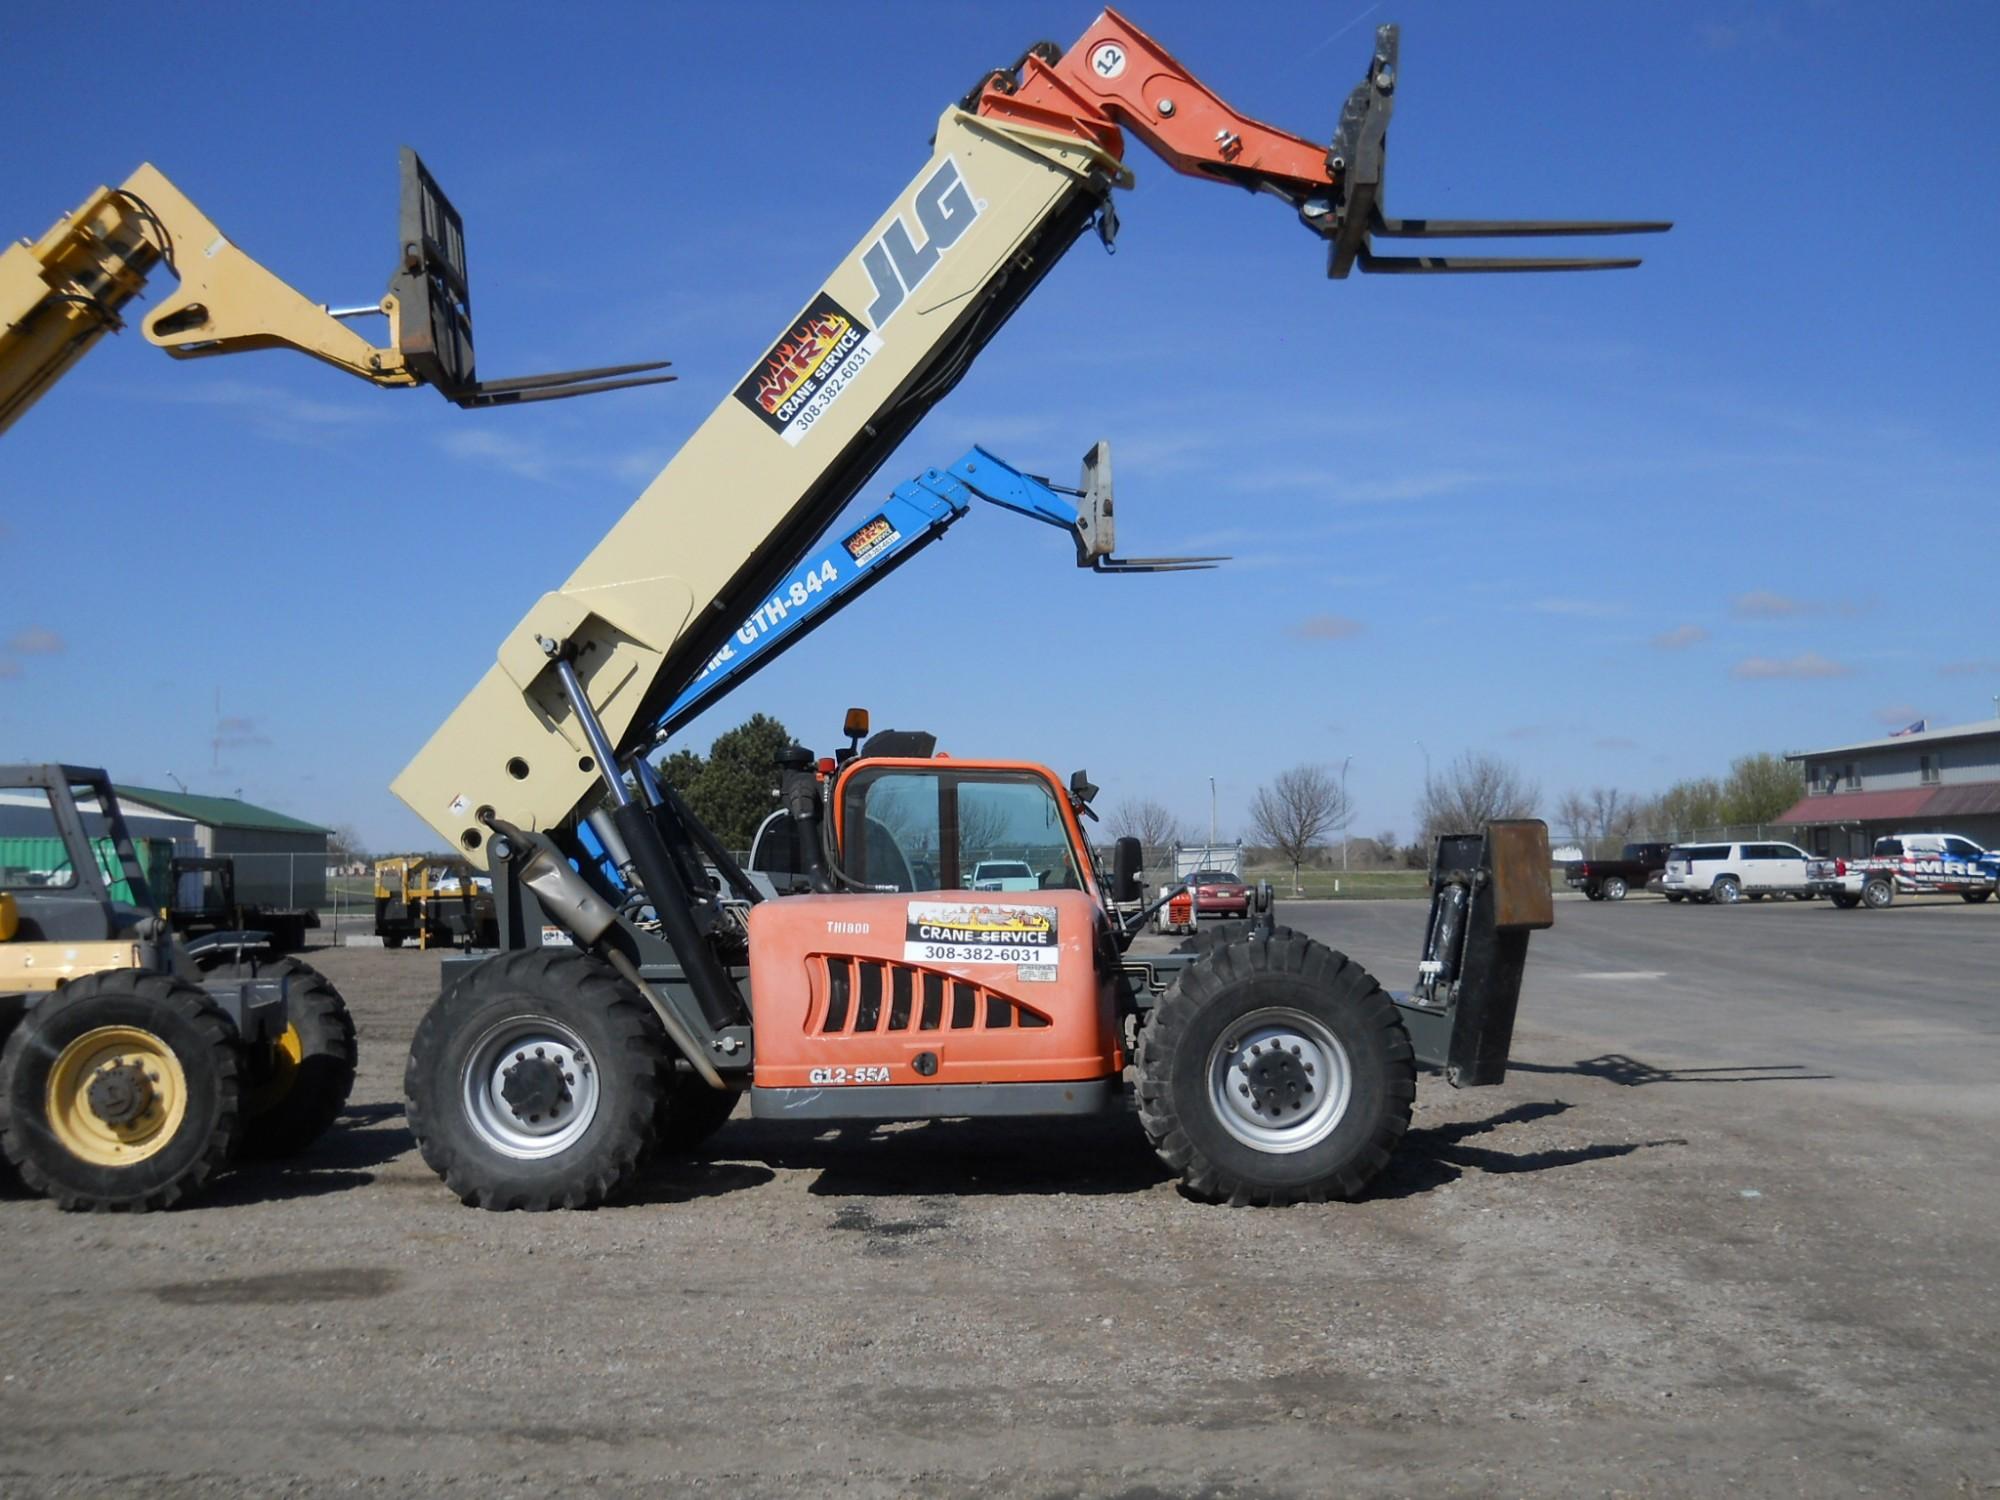 12K Telehandler - MRL Crane Service & Equipment Rental